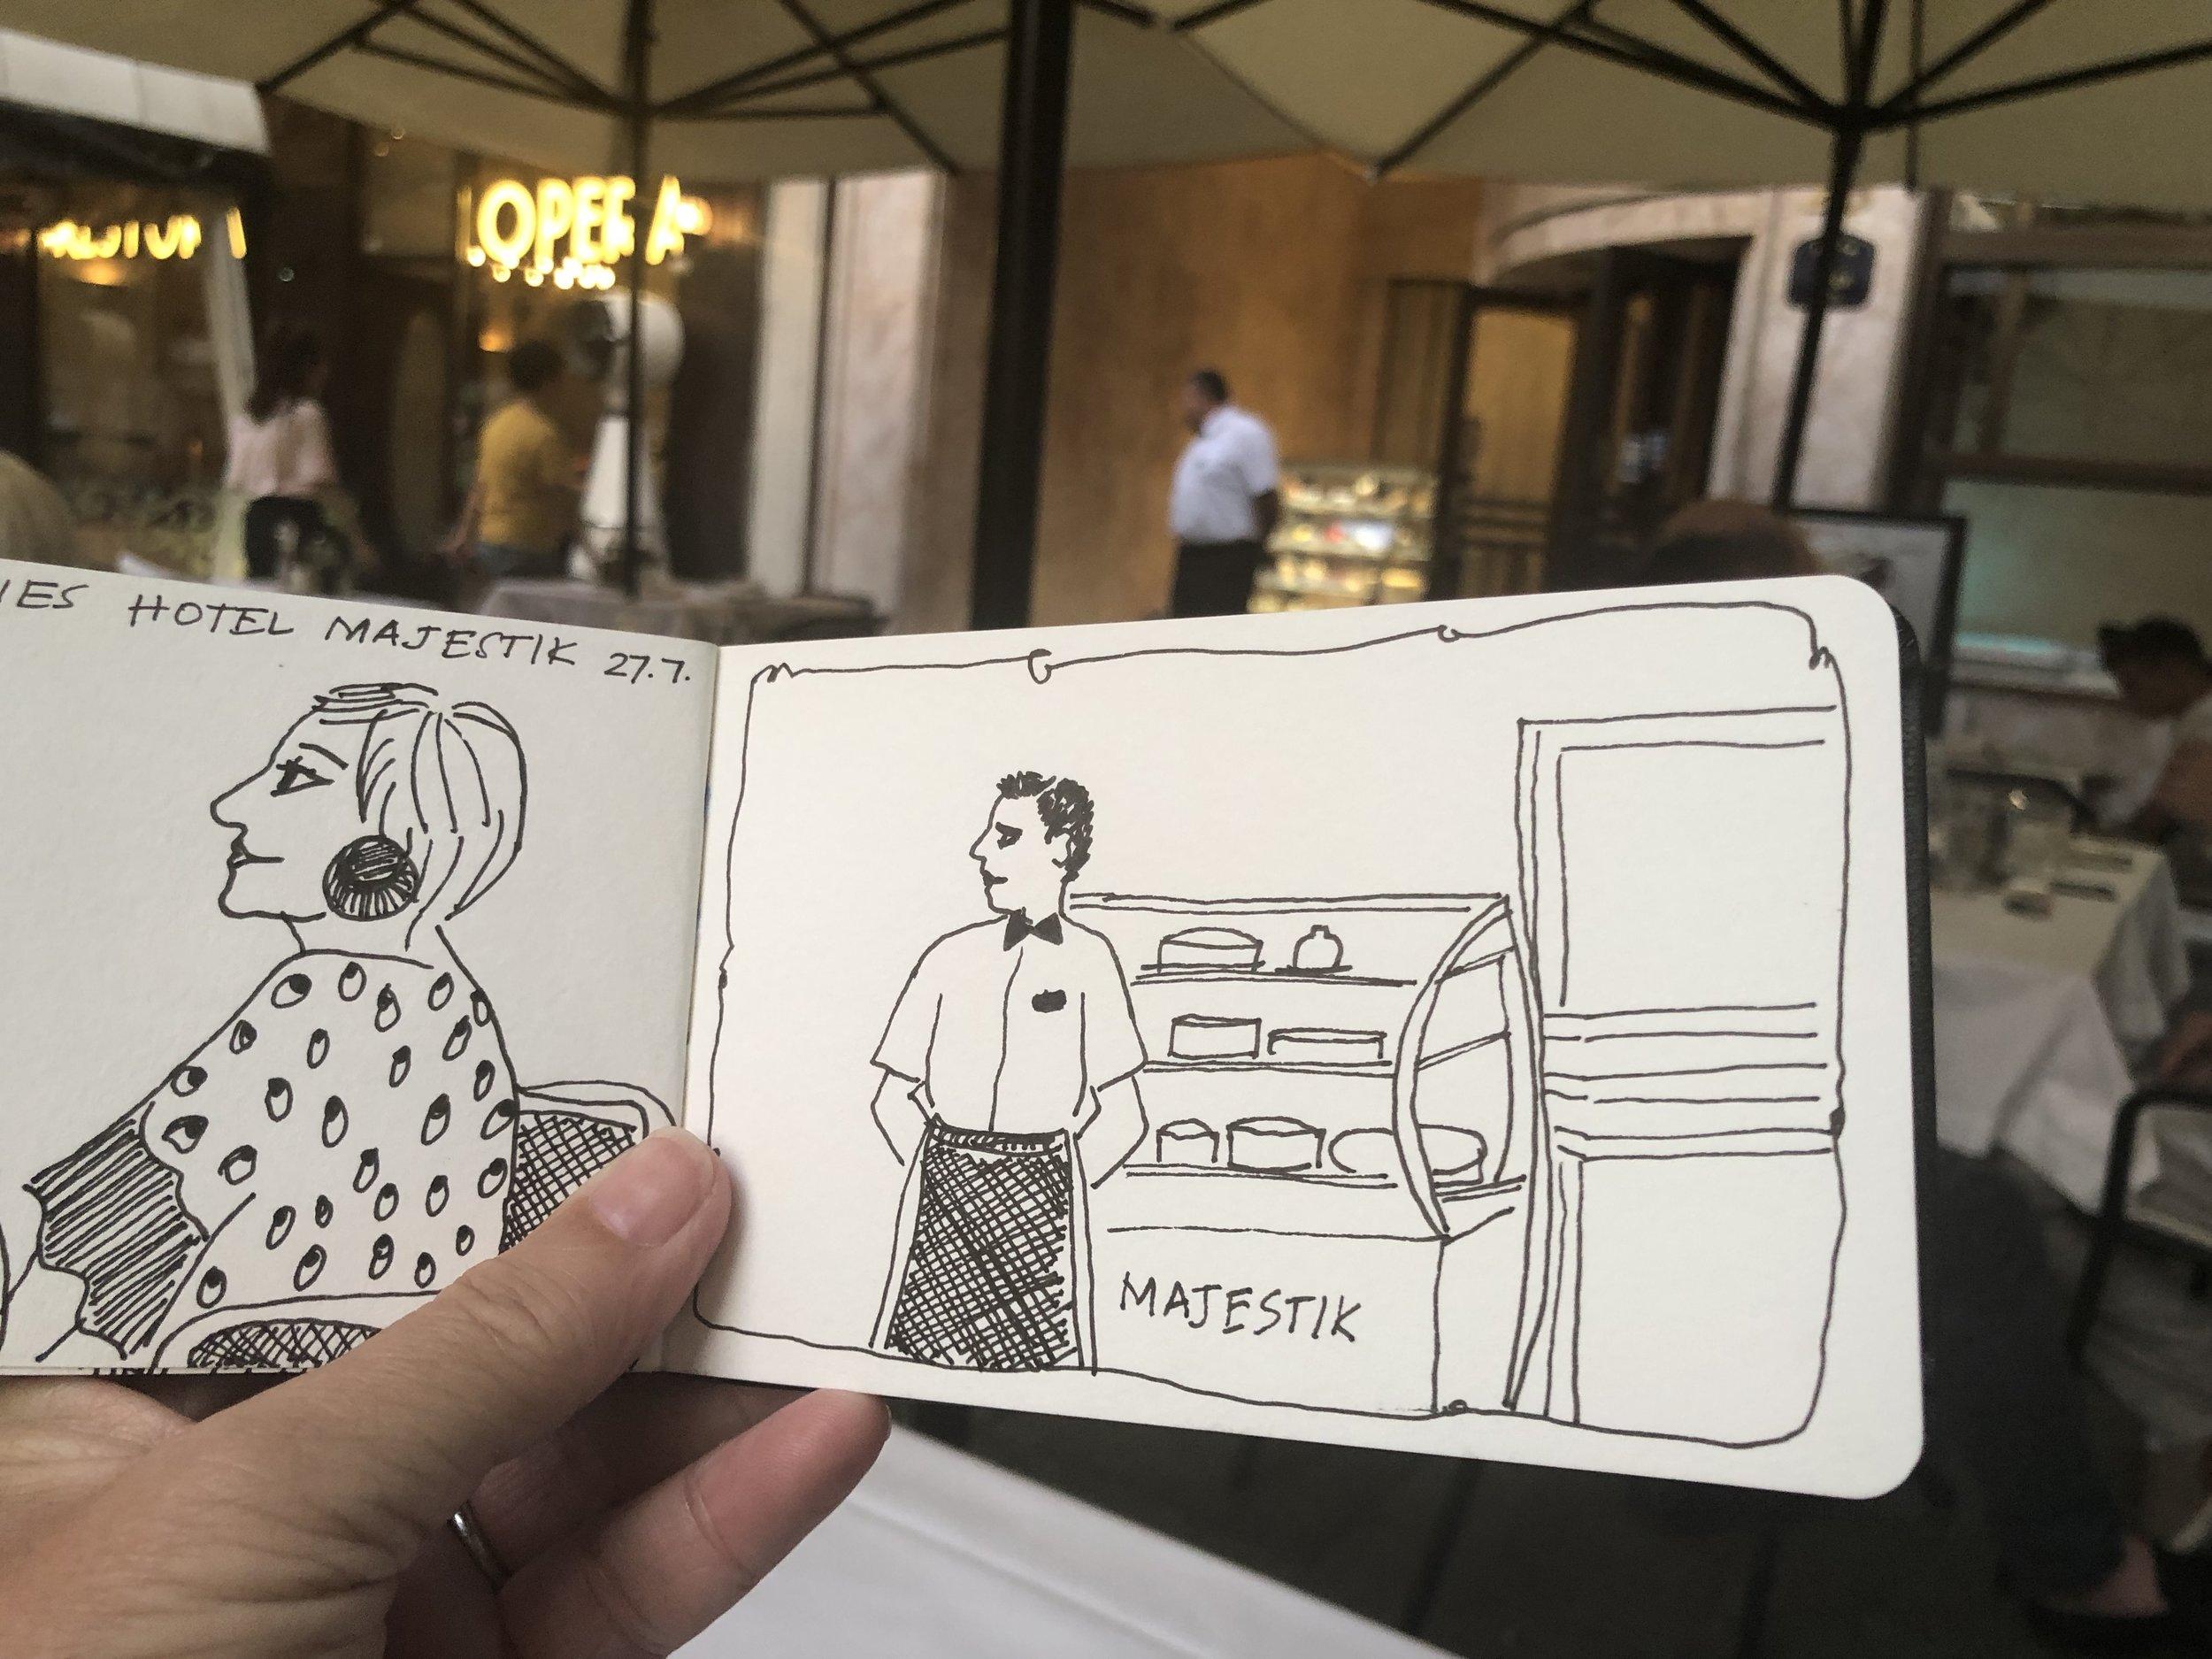 Majestik Hotel waiters